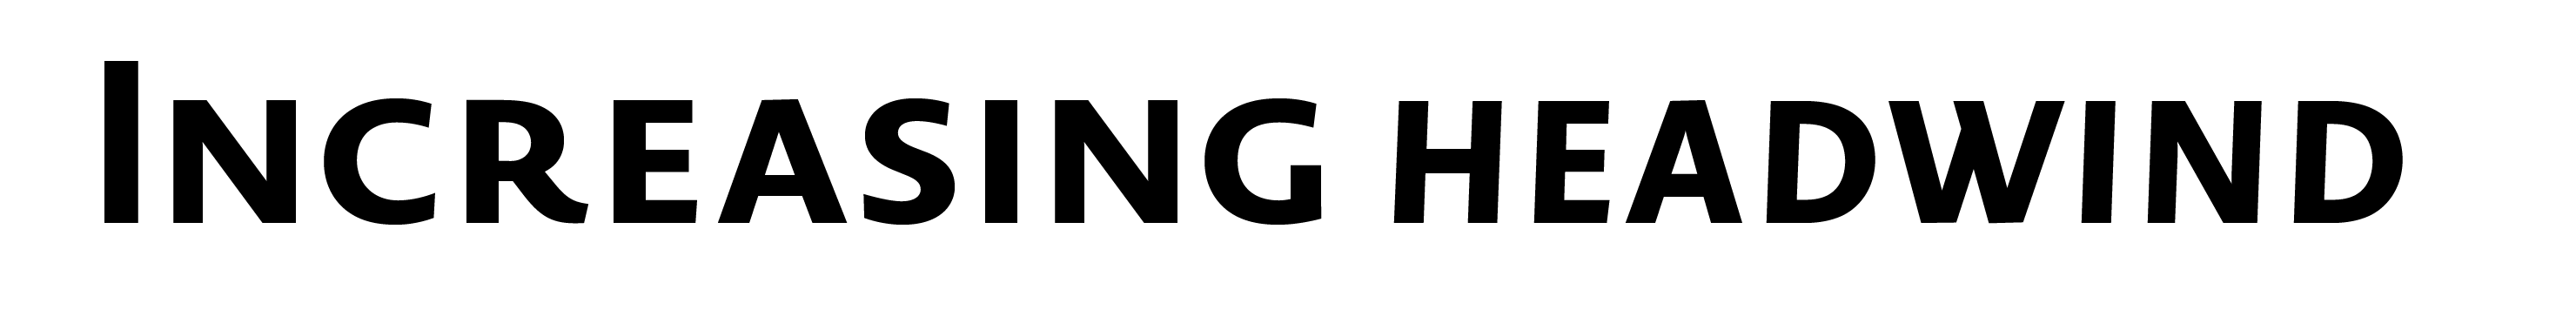 Typeface Novel Sans D11 Atlas Font Foundry